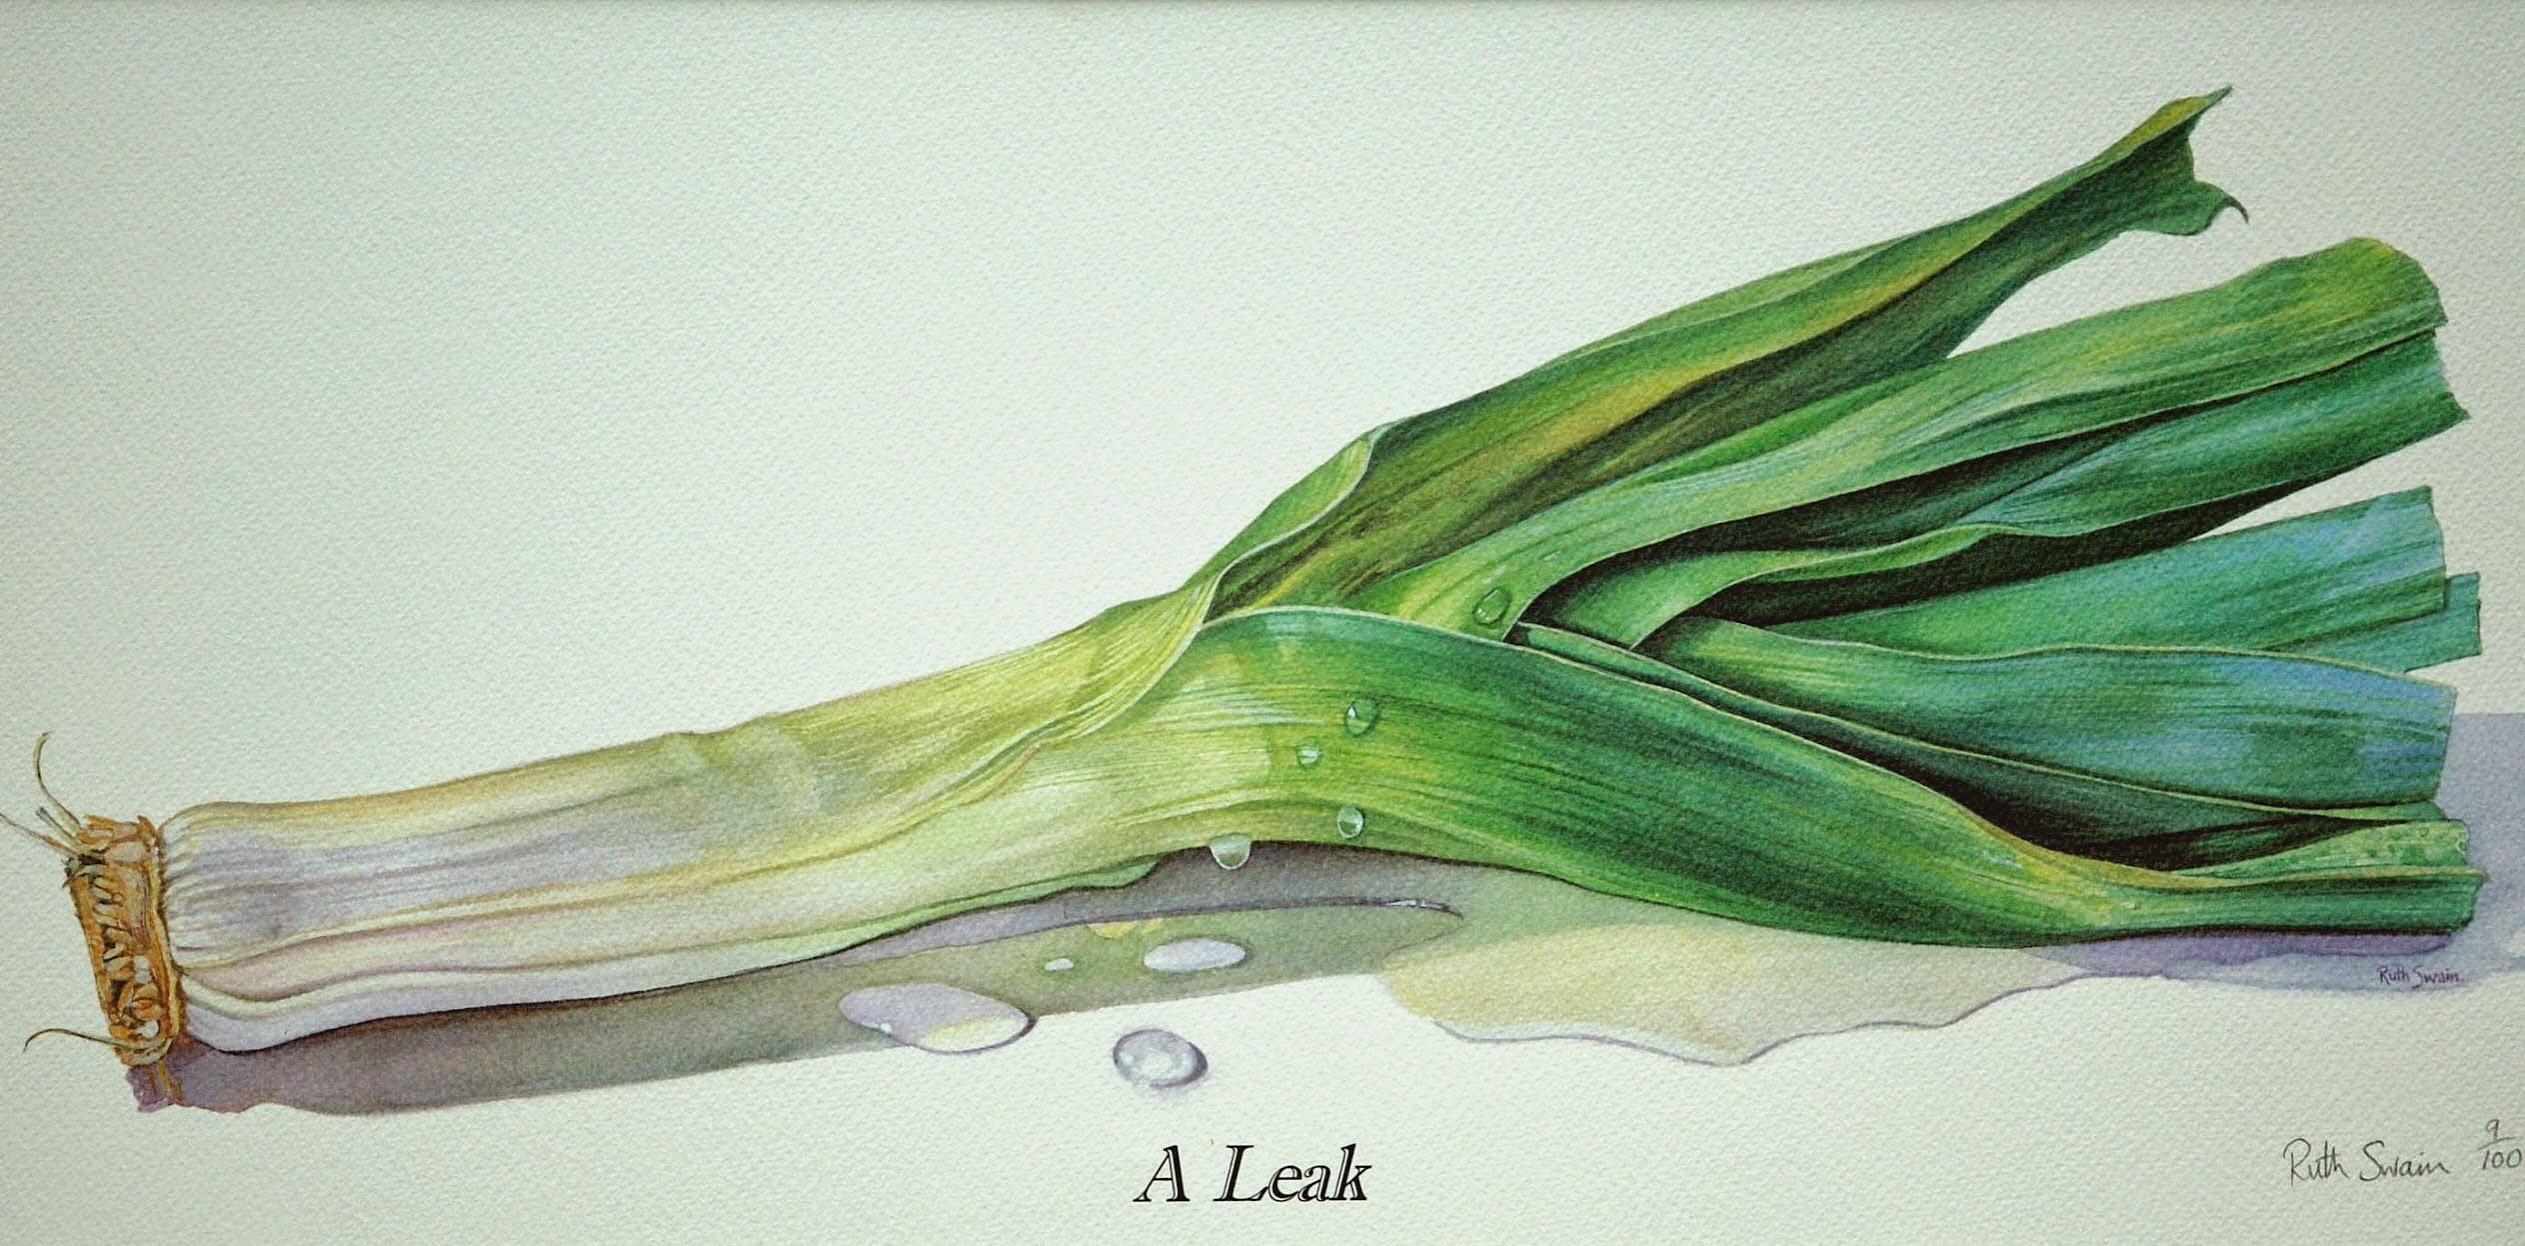 A Leak